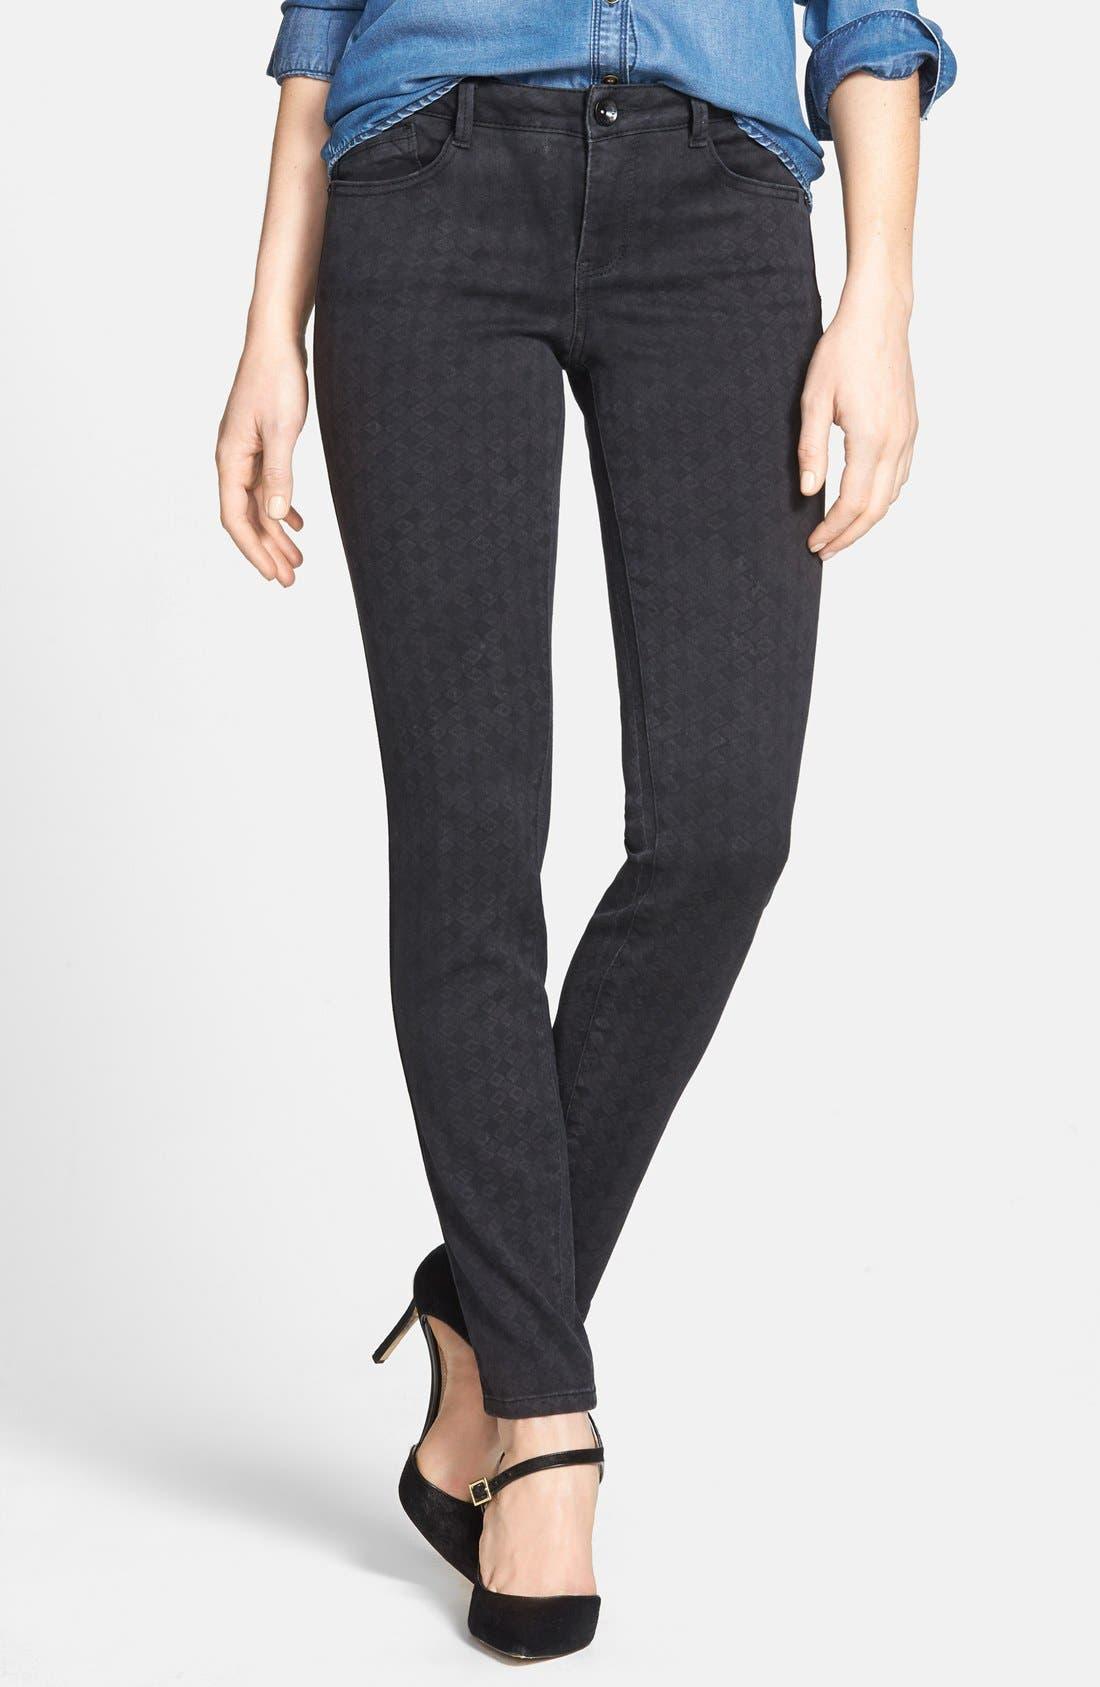 Alternate Image 1 Selected - Wit & Wisdom Diamond Stencil Skinny Jeans (Black) (Nordstrom Exclusive)